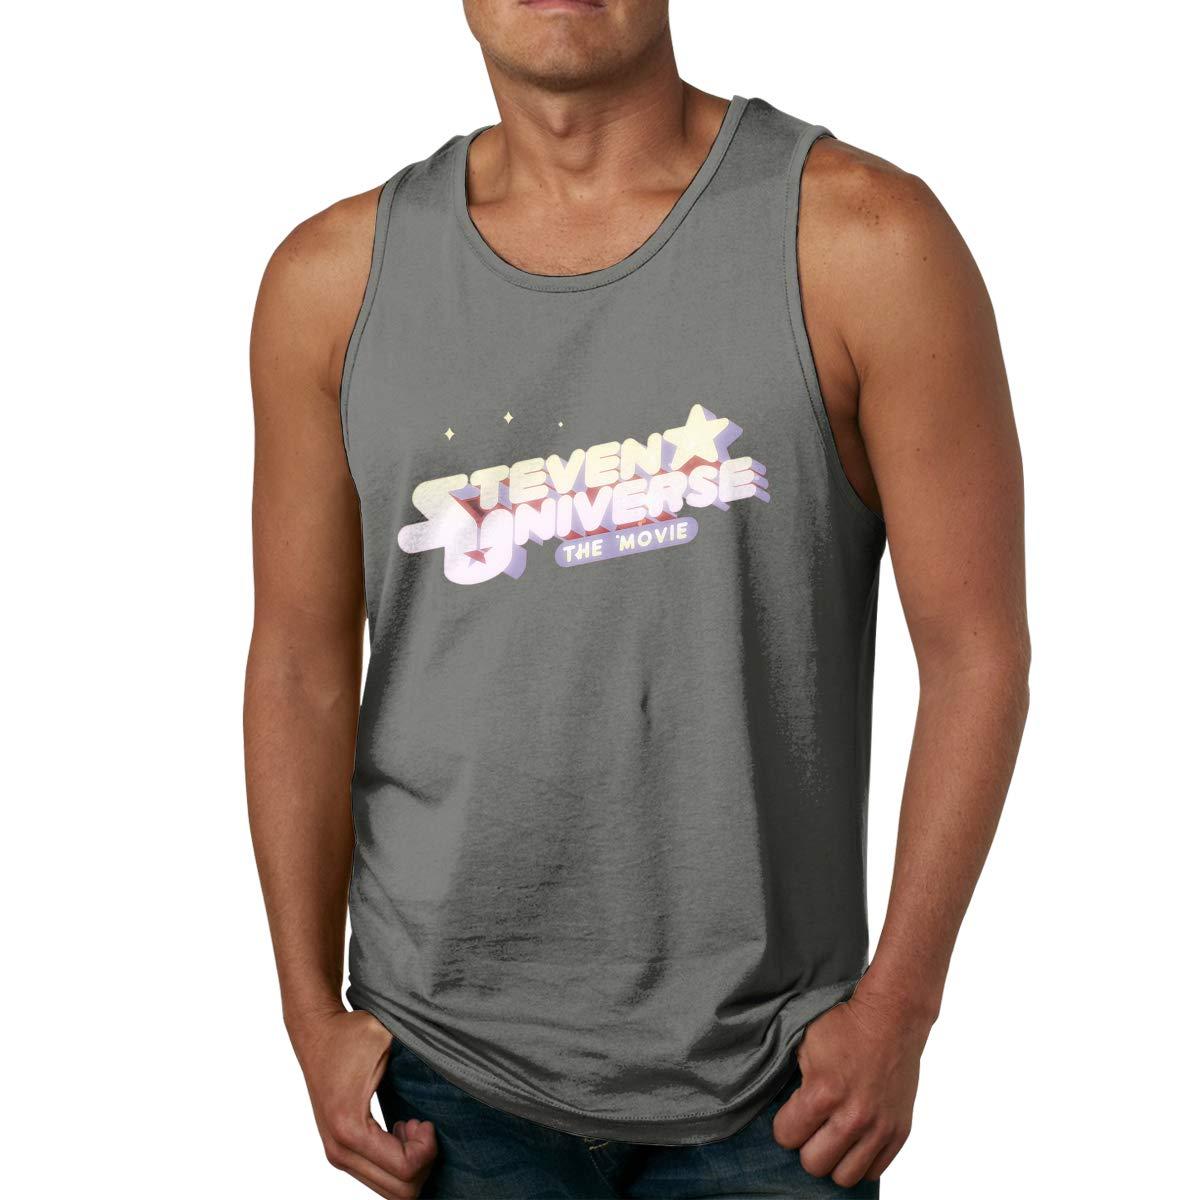 S Steven Universe Heraldic Shield Durable Ness Sleeveless Tank Tops Tees Shirts